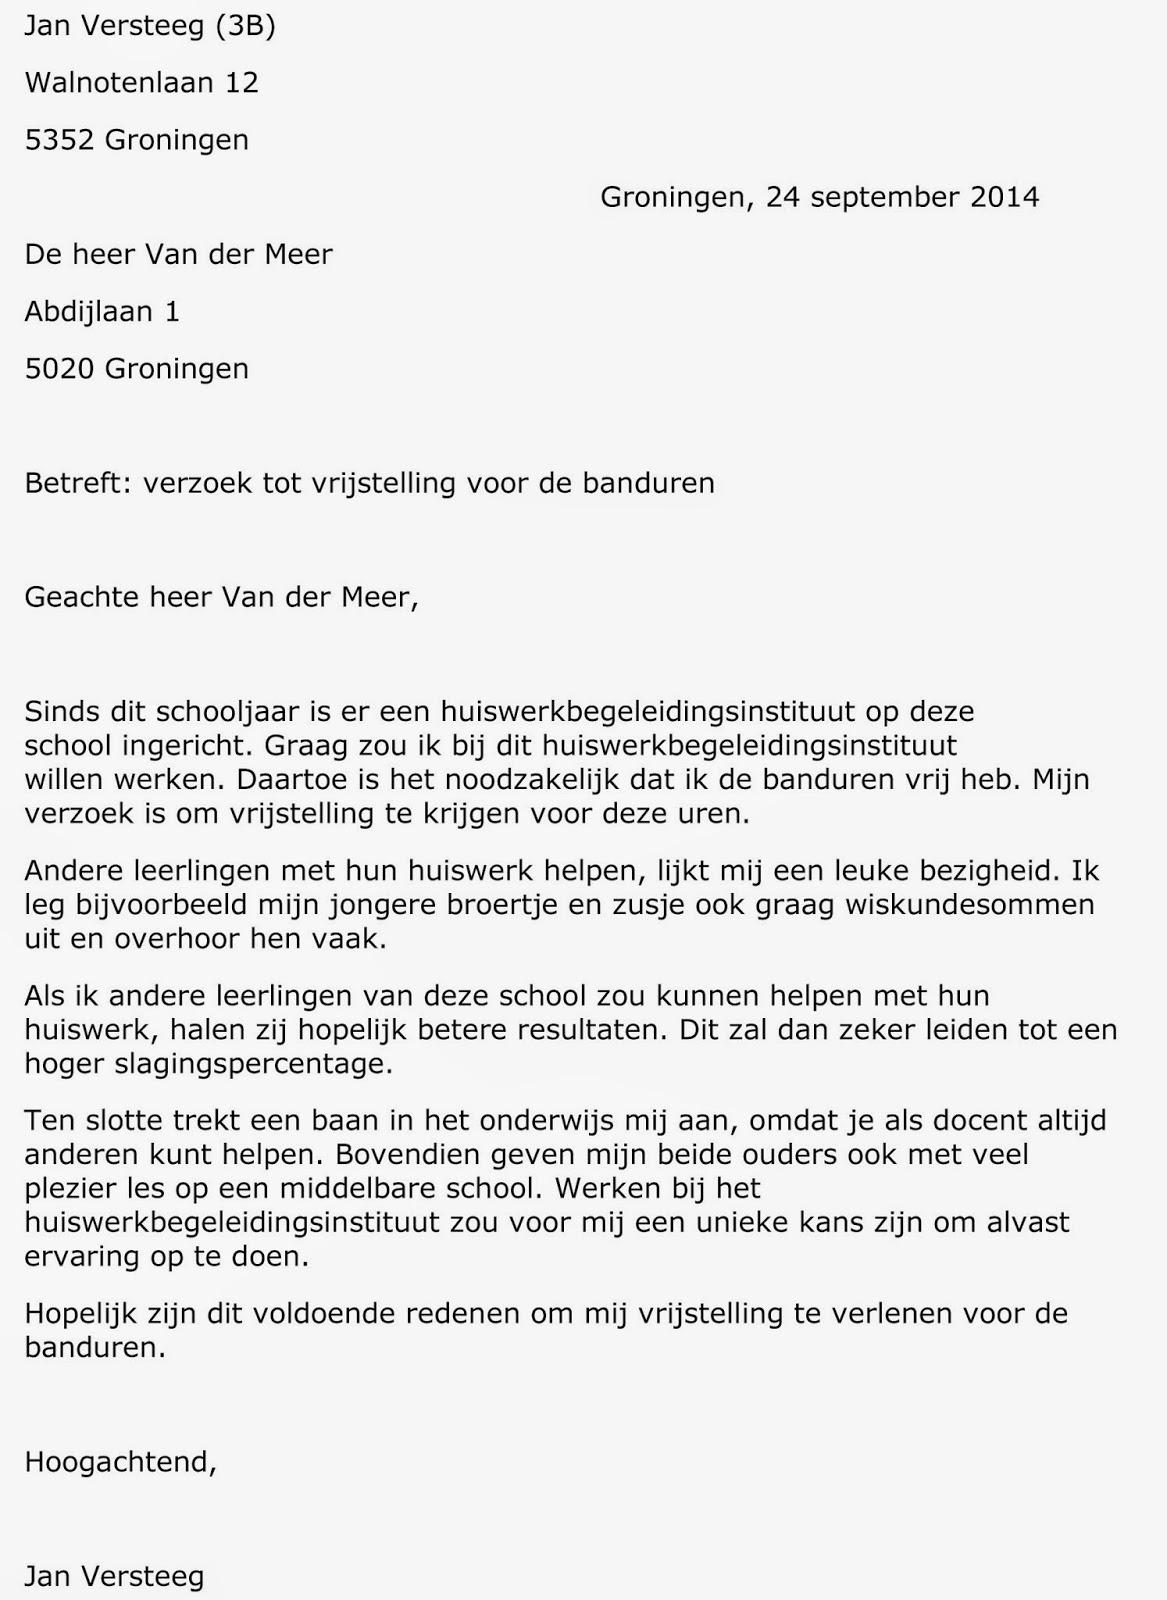 schrijfdossier Sietze Sjollema: Zakelijke brief